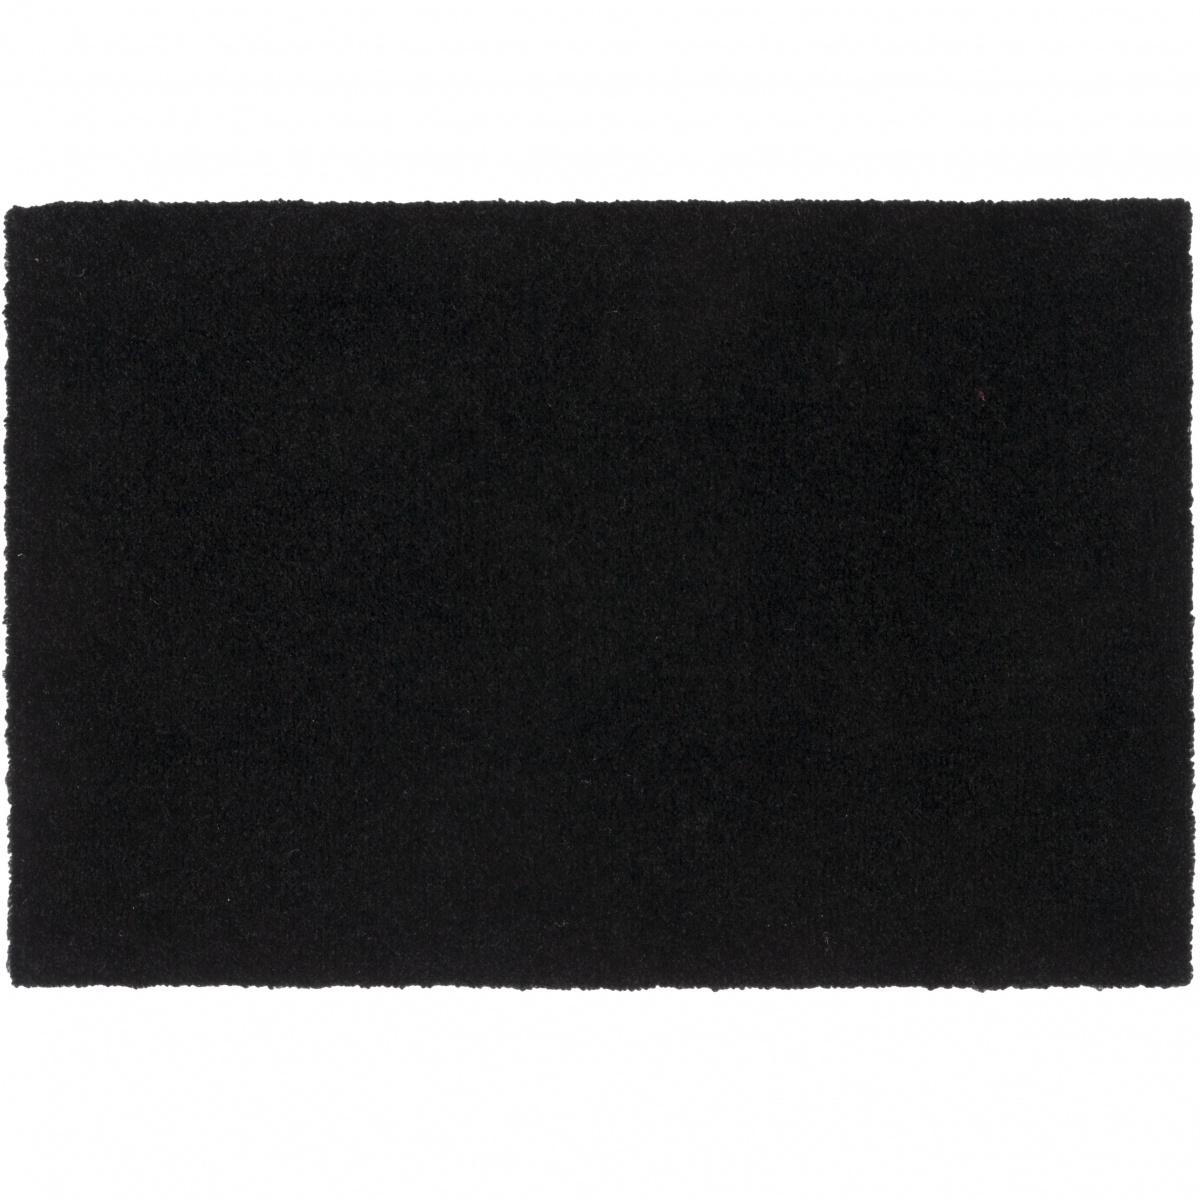 Tica dørmåtte, sort -  40x60